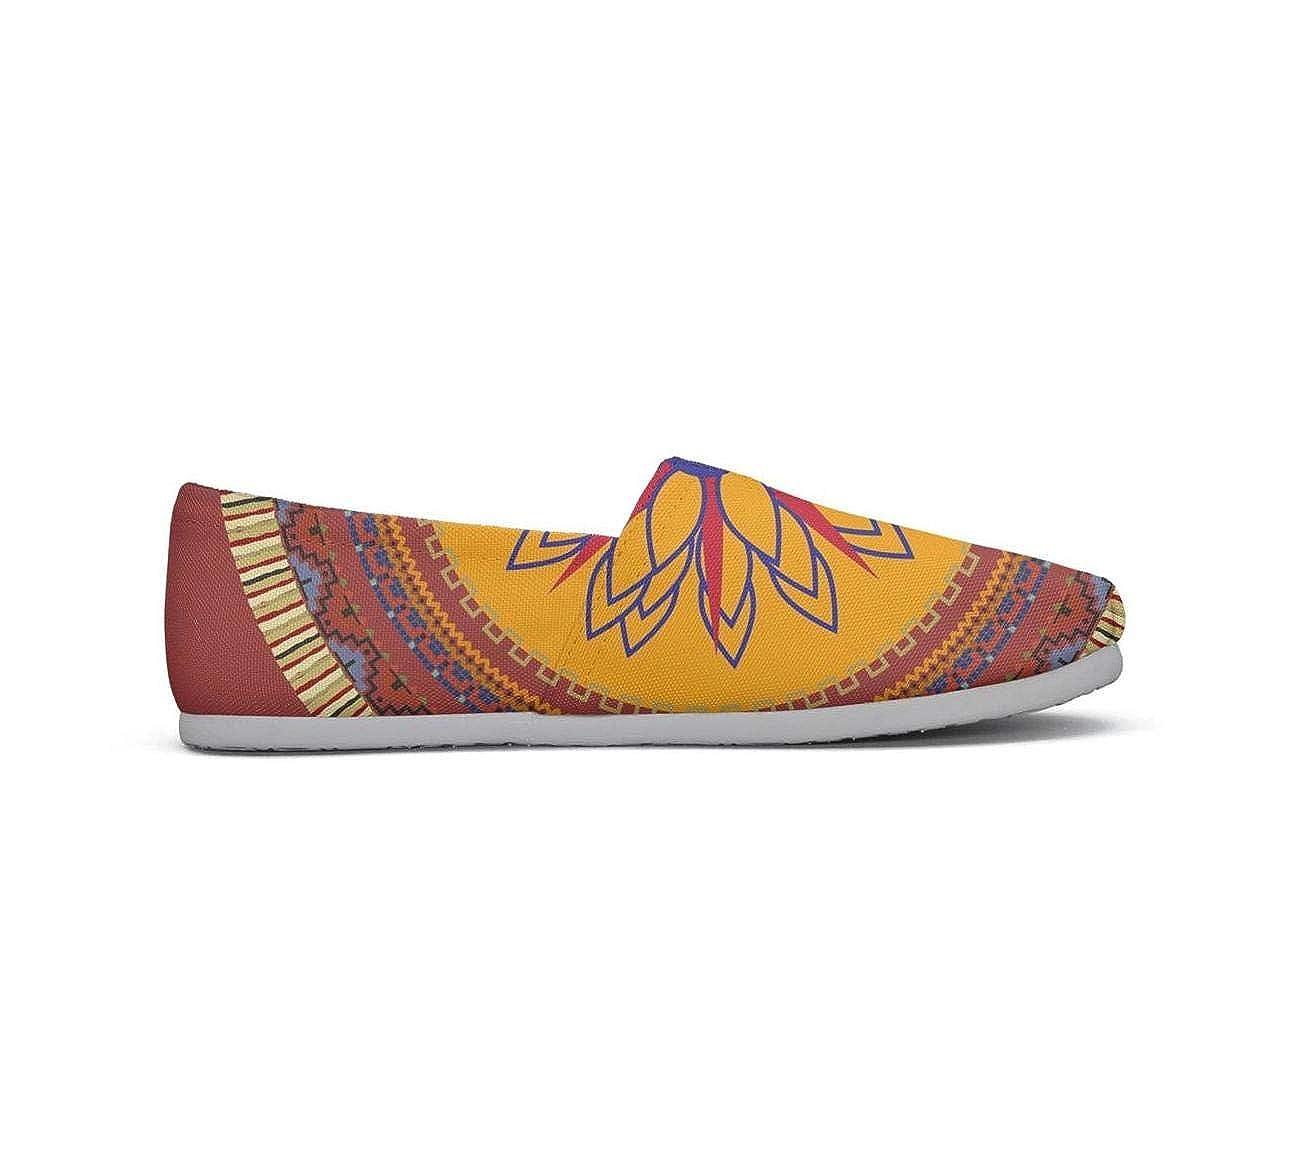 nkfbx red Mandala Boho Bohemian Casual Slip-On Canva Shoes for Girls Travel